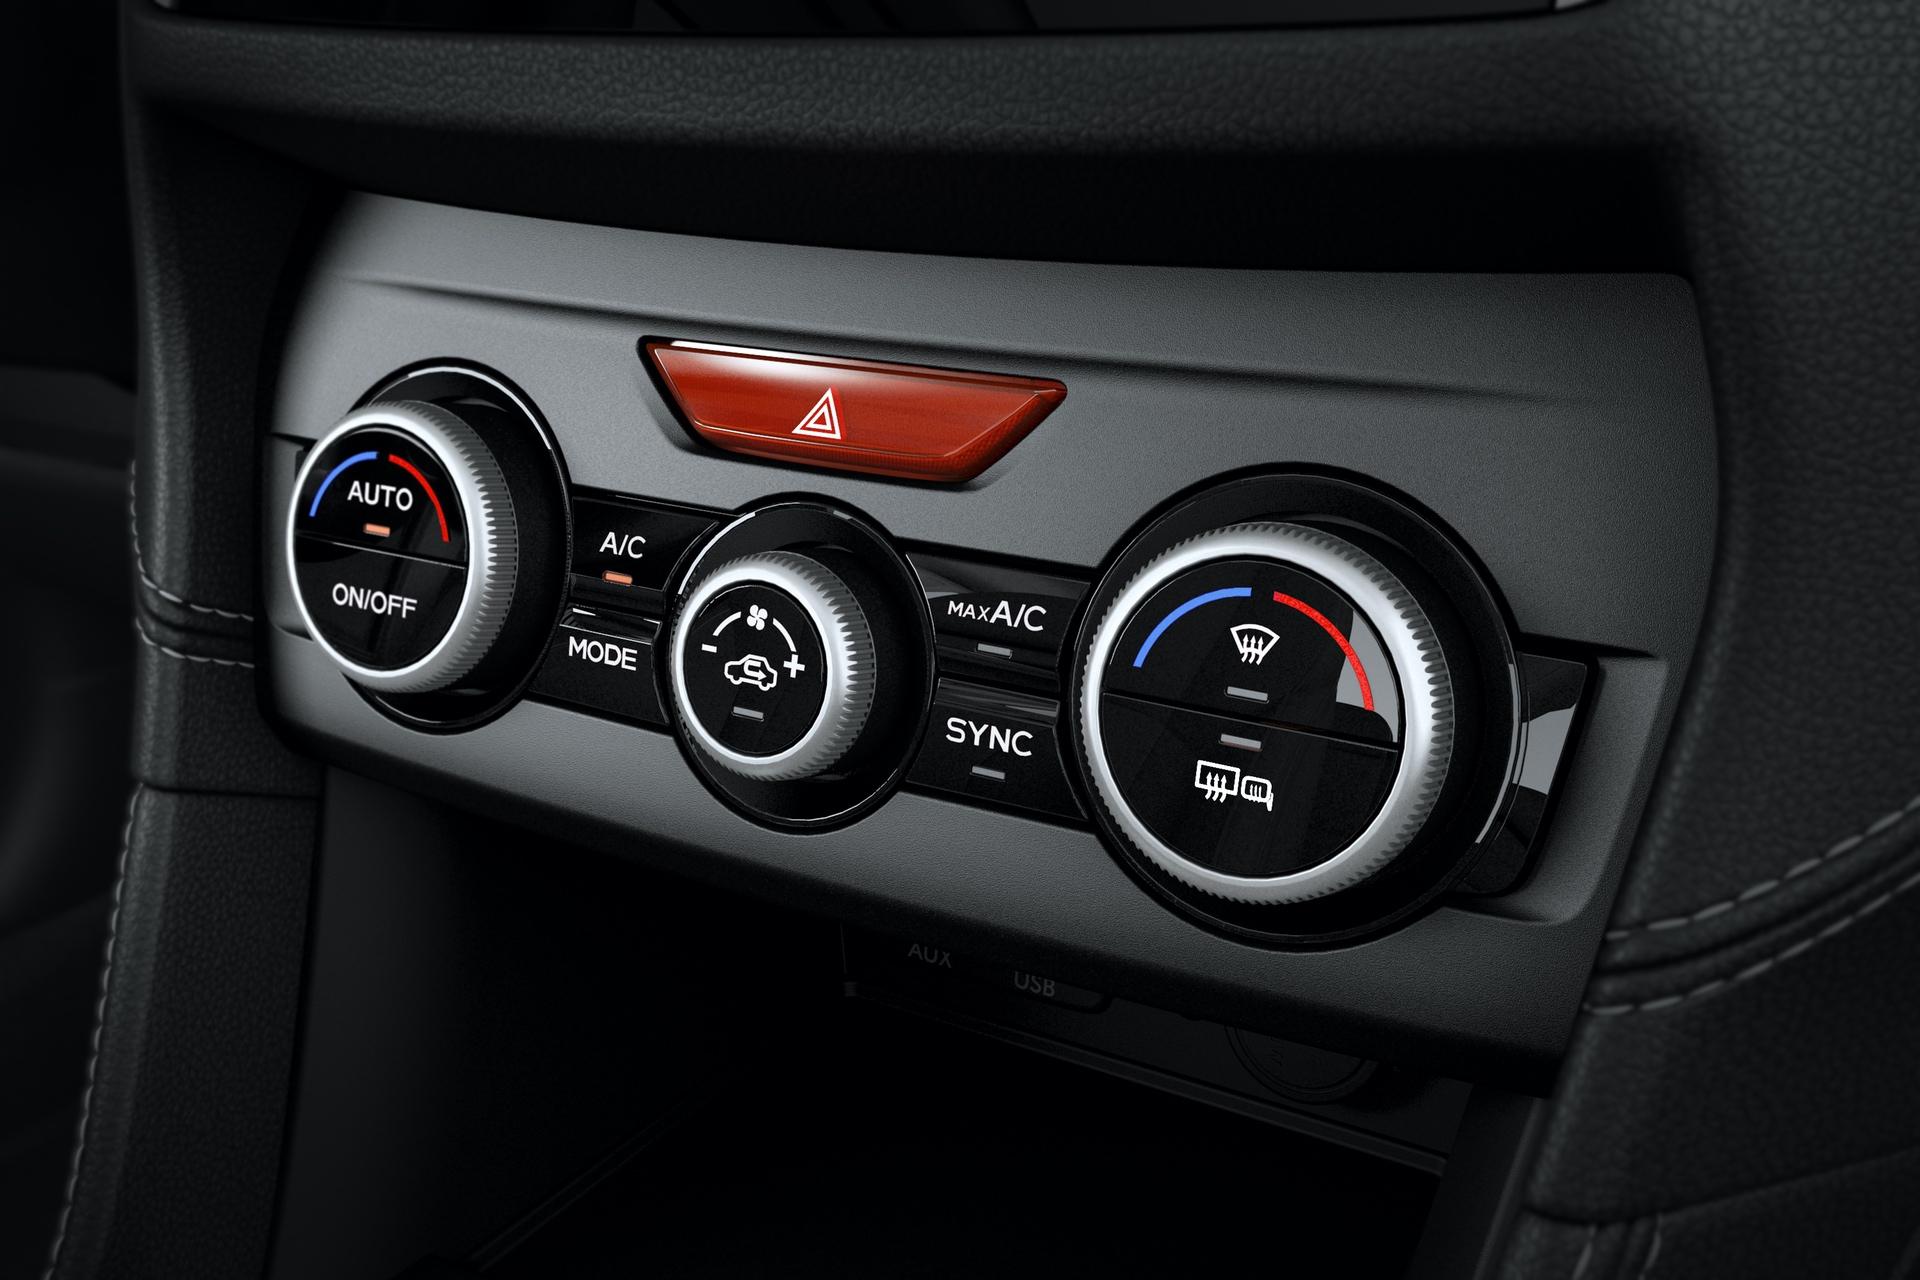 First_Drive_Subaru_Impreza_0018